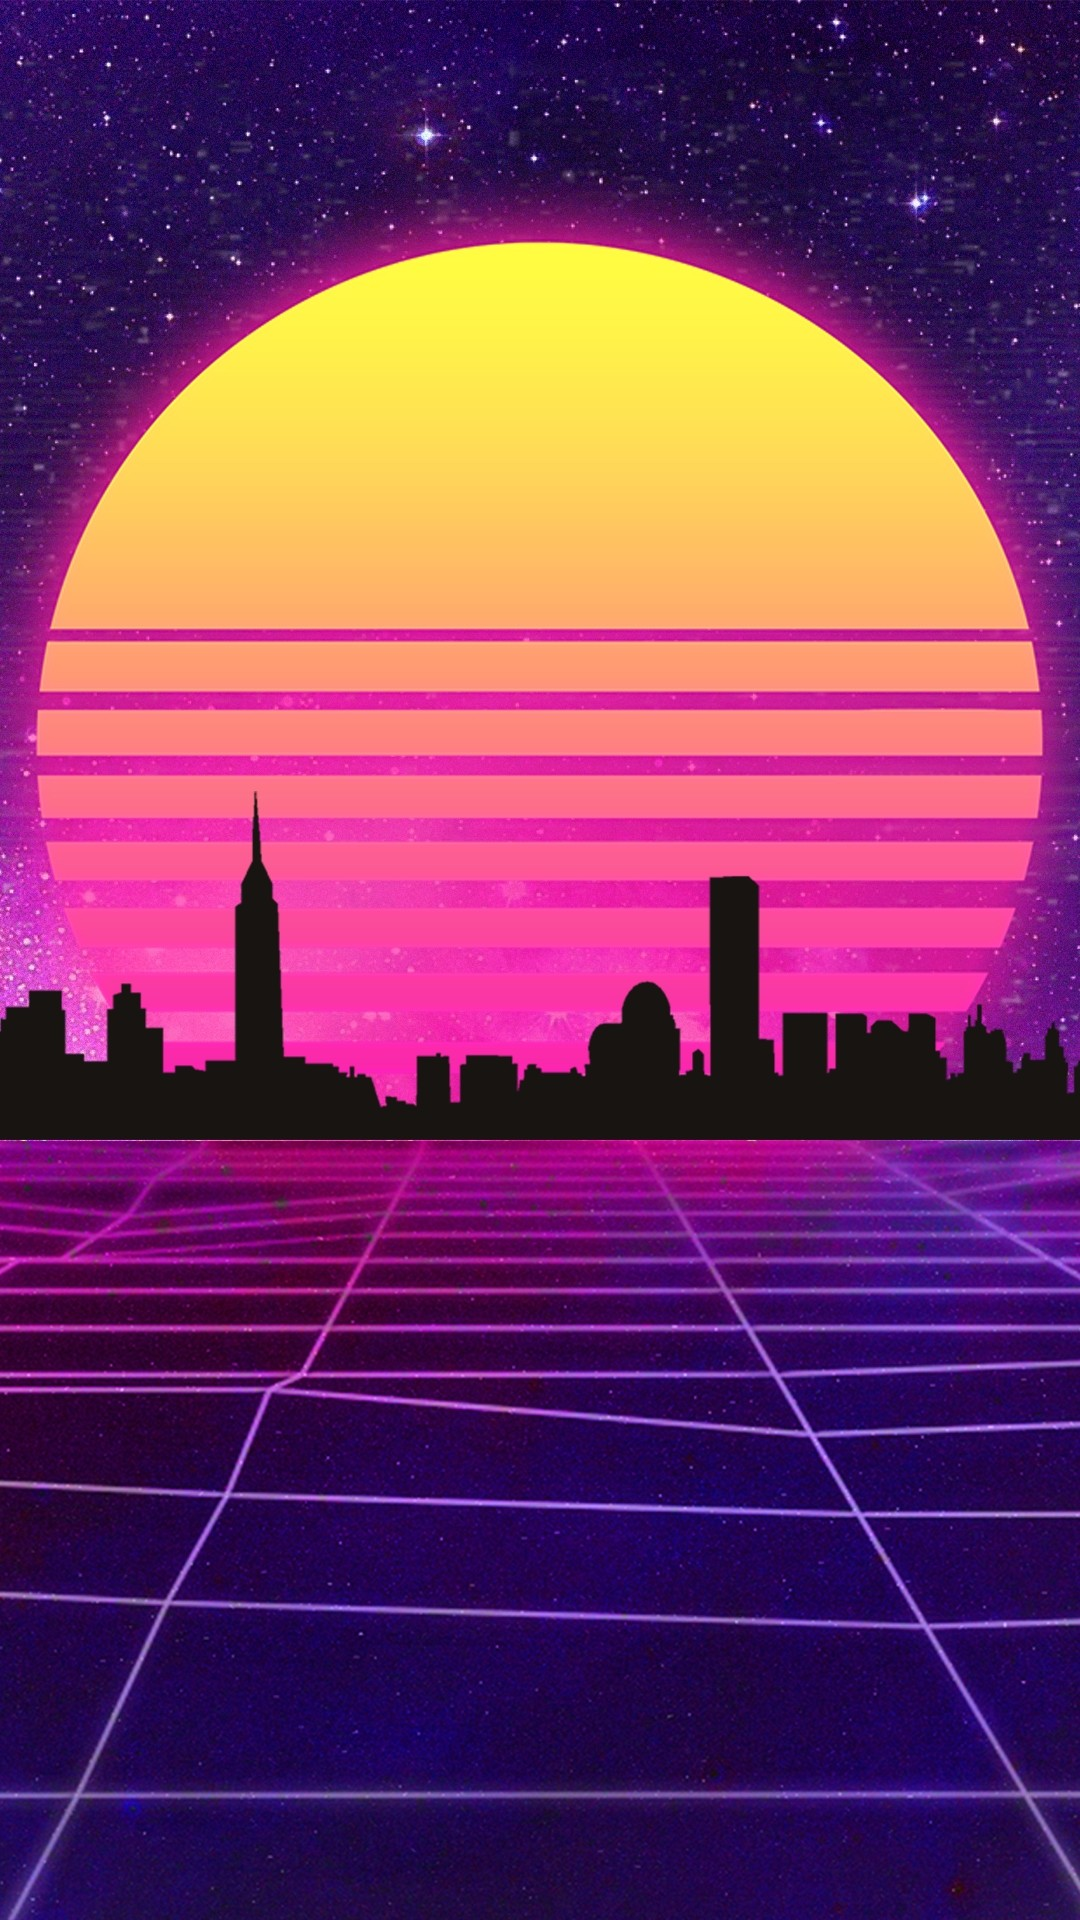 Vaporwave iPhone hd wallpaper